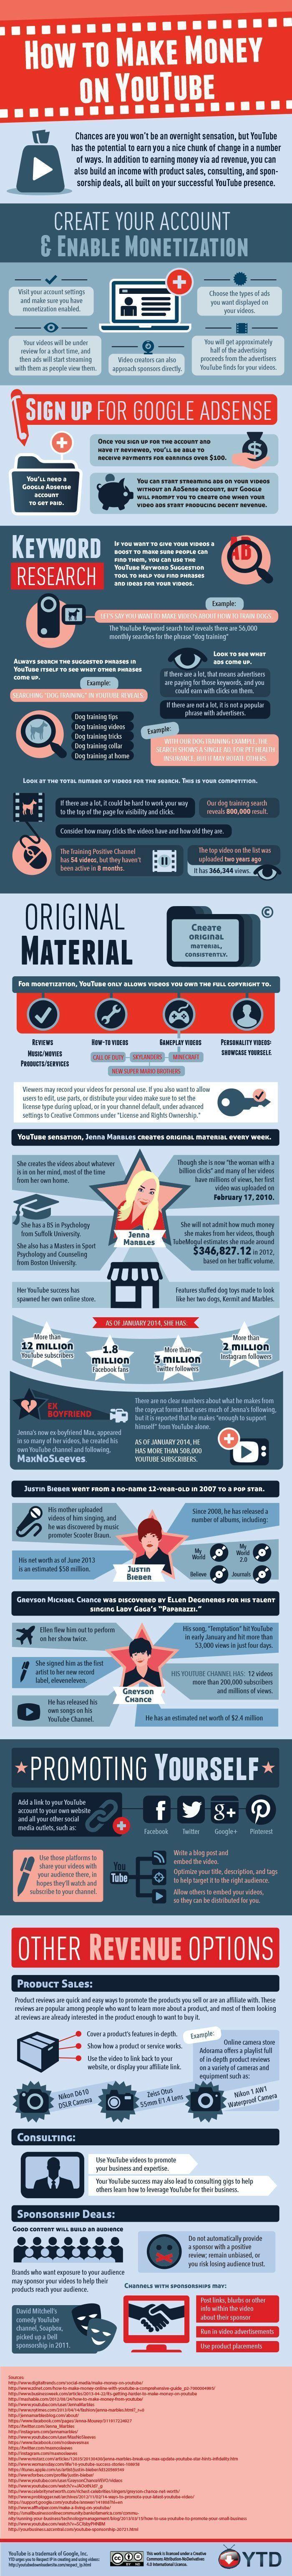 How to make money on Youtube #infographic @rubendelaosa http://www.rubendelaosa.com/